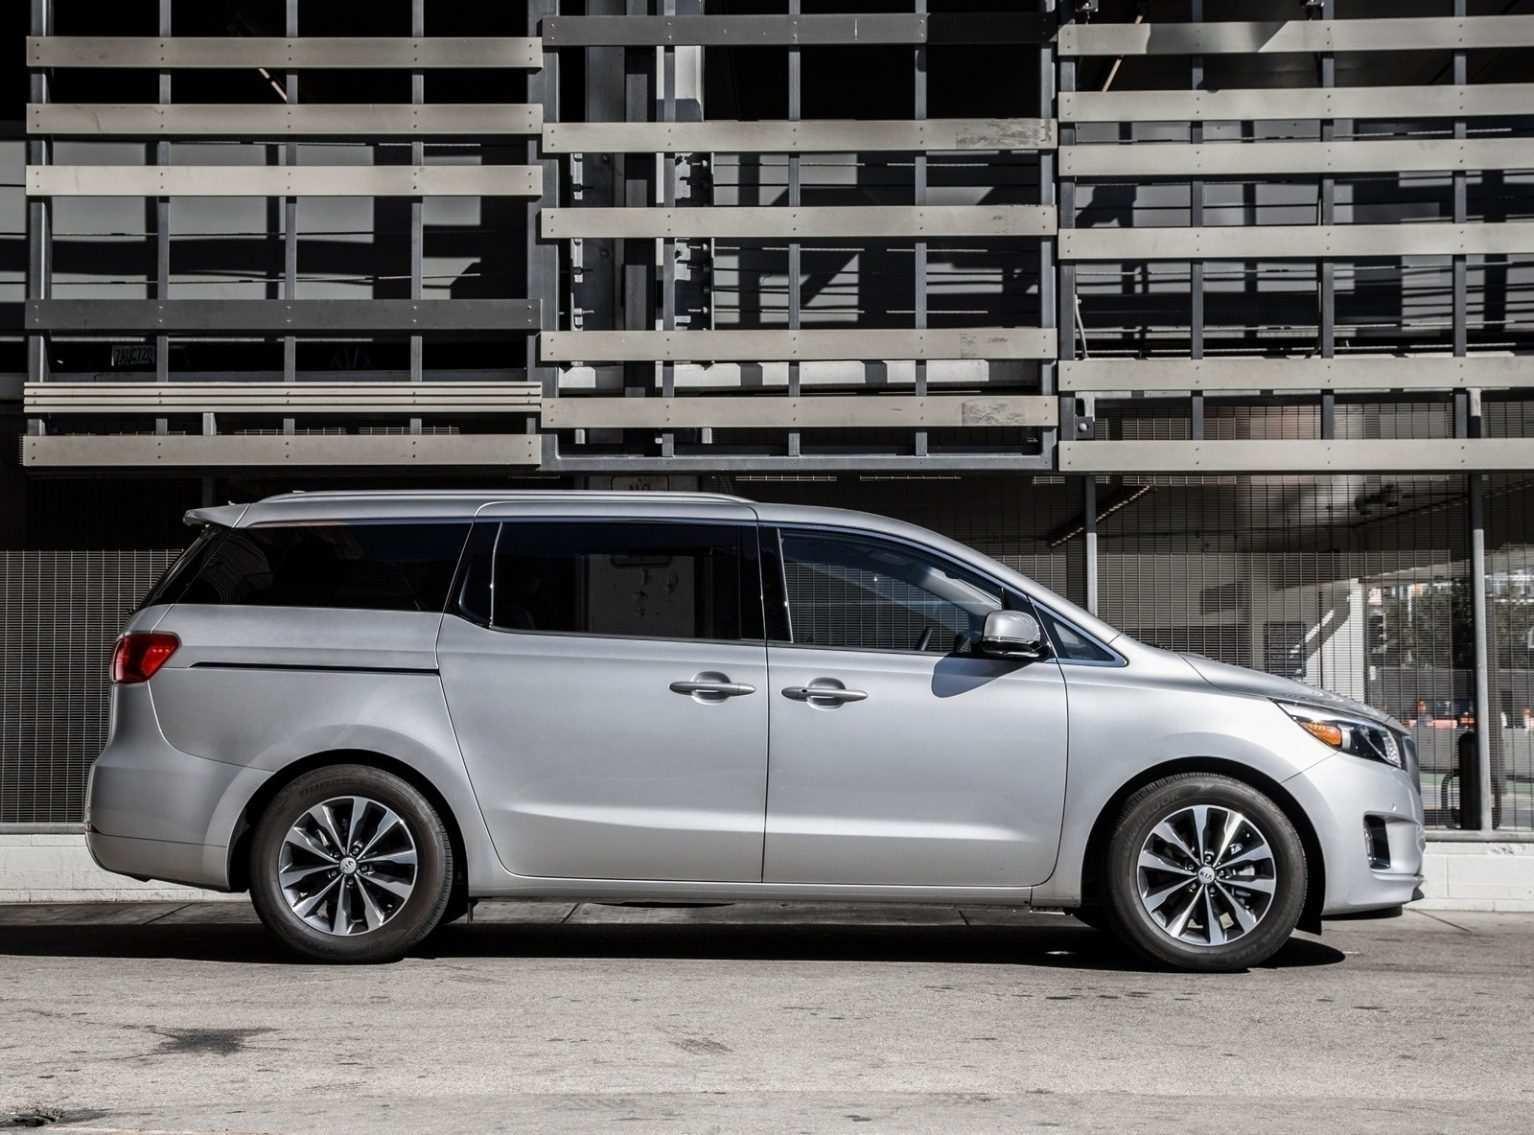 14 Gallery of The Kia Minivan 2019 Exterior Wallpaper with The Kia Minivan 2019 Exterior